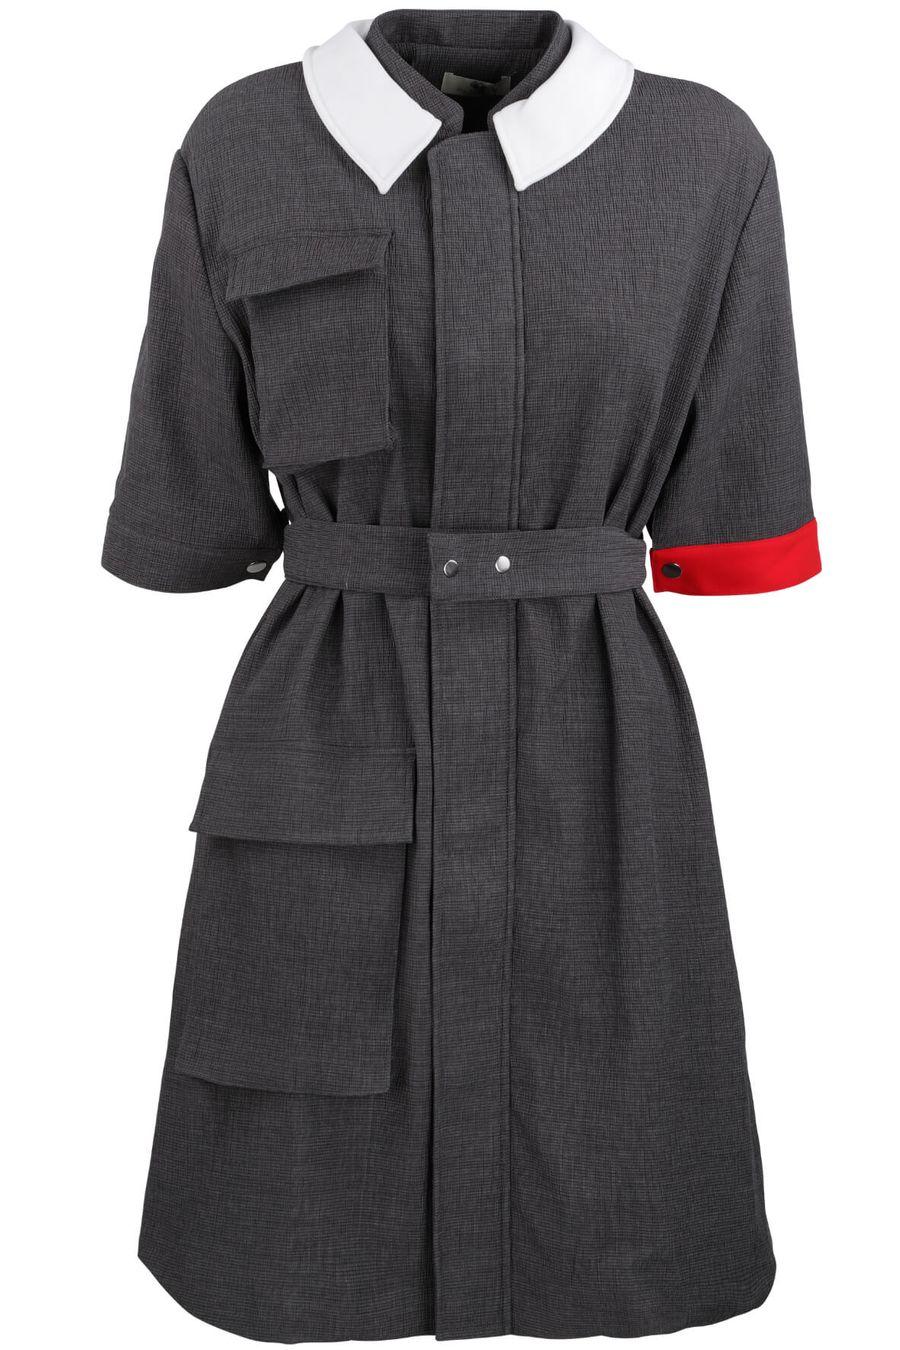 cubic-original-carroll-dress-1